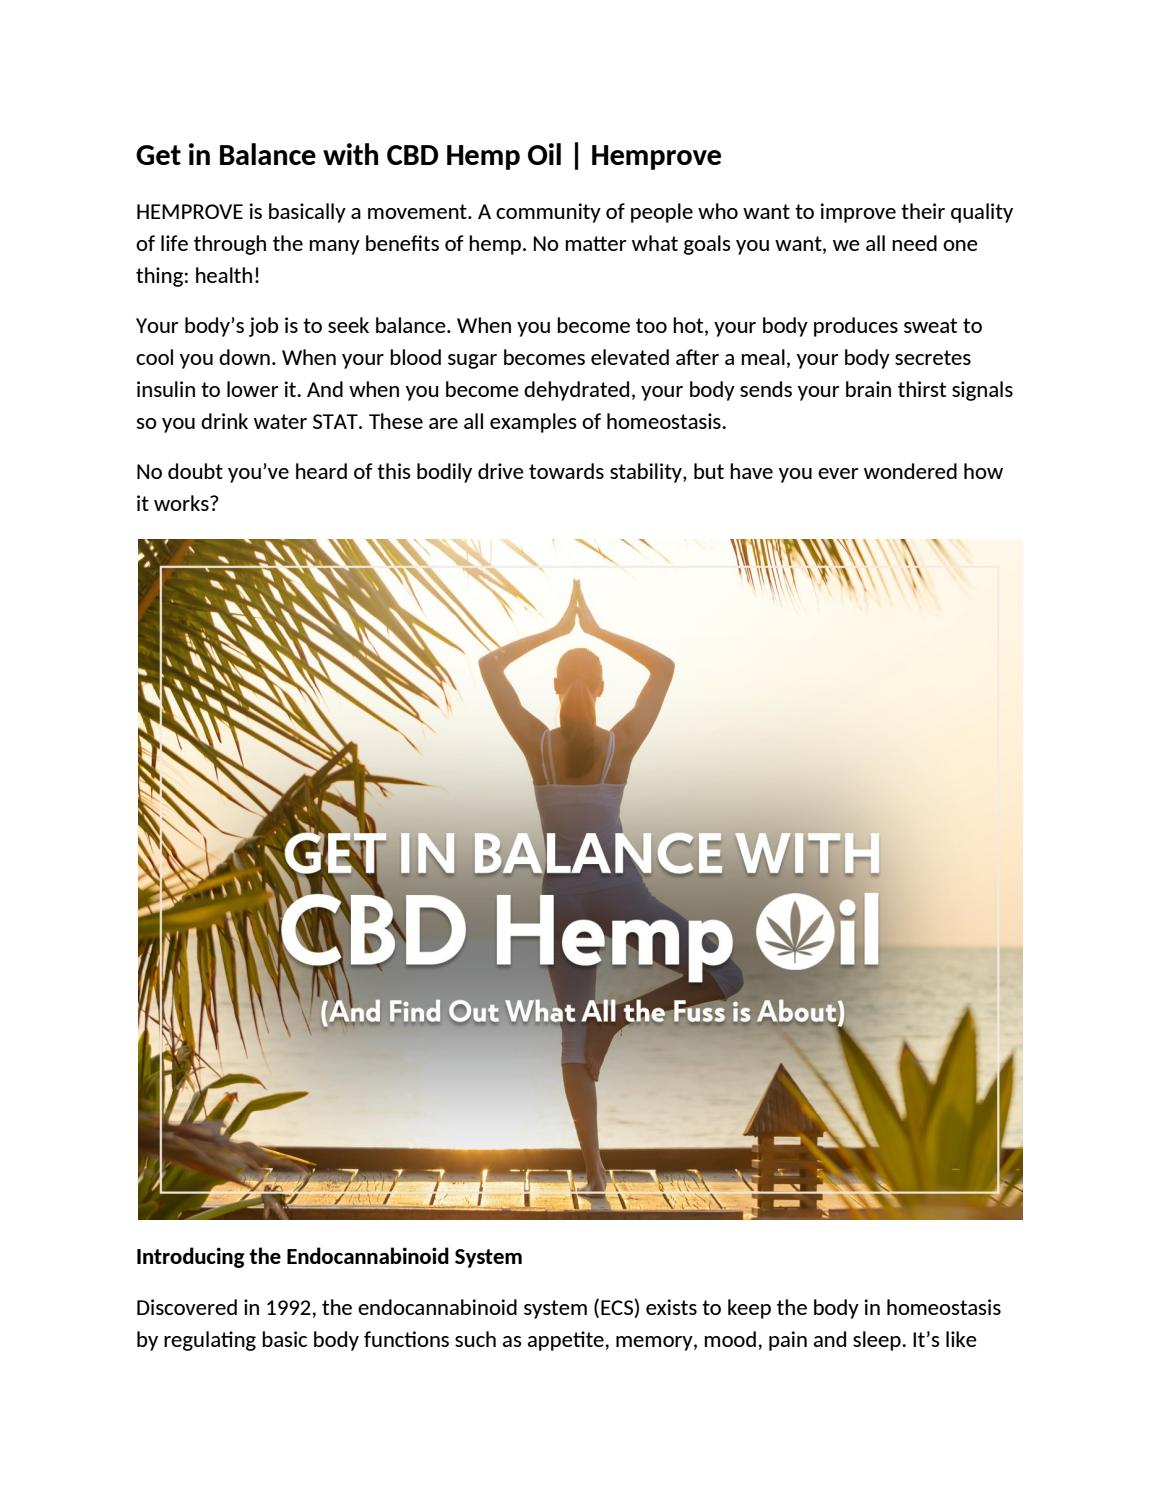 Hemprove - Get in Balance with CBD Hemp Oil by hemprove cbd - issuu